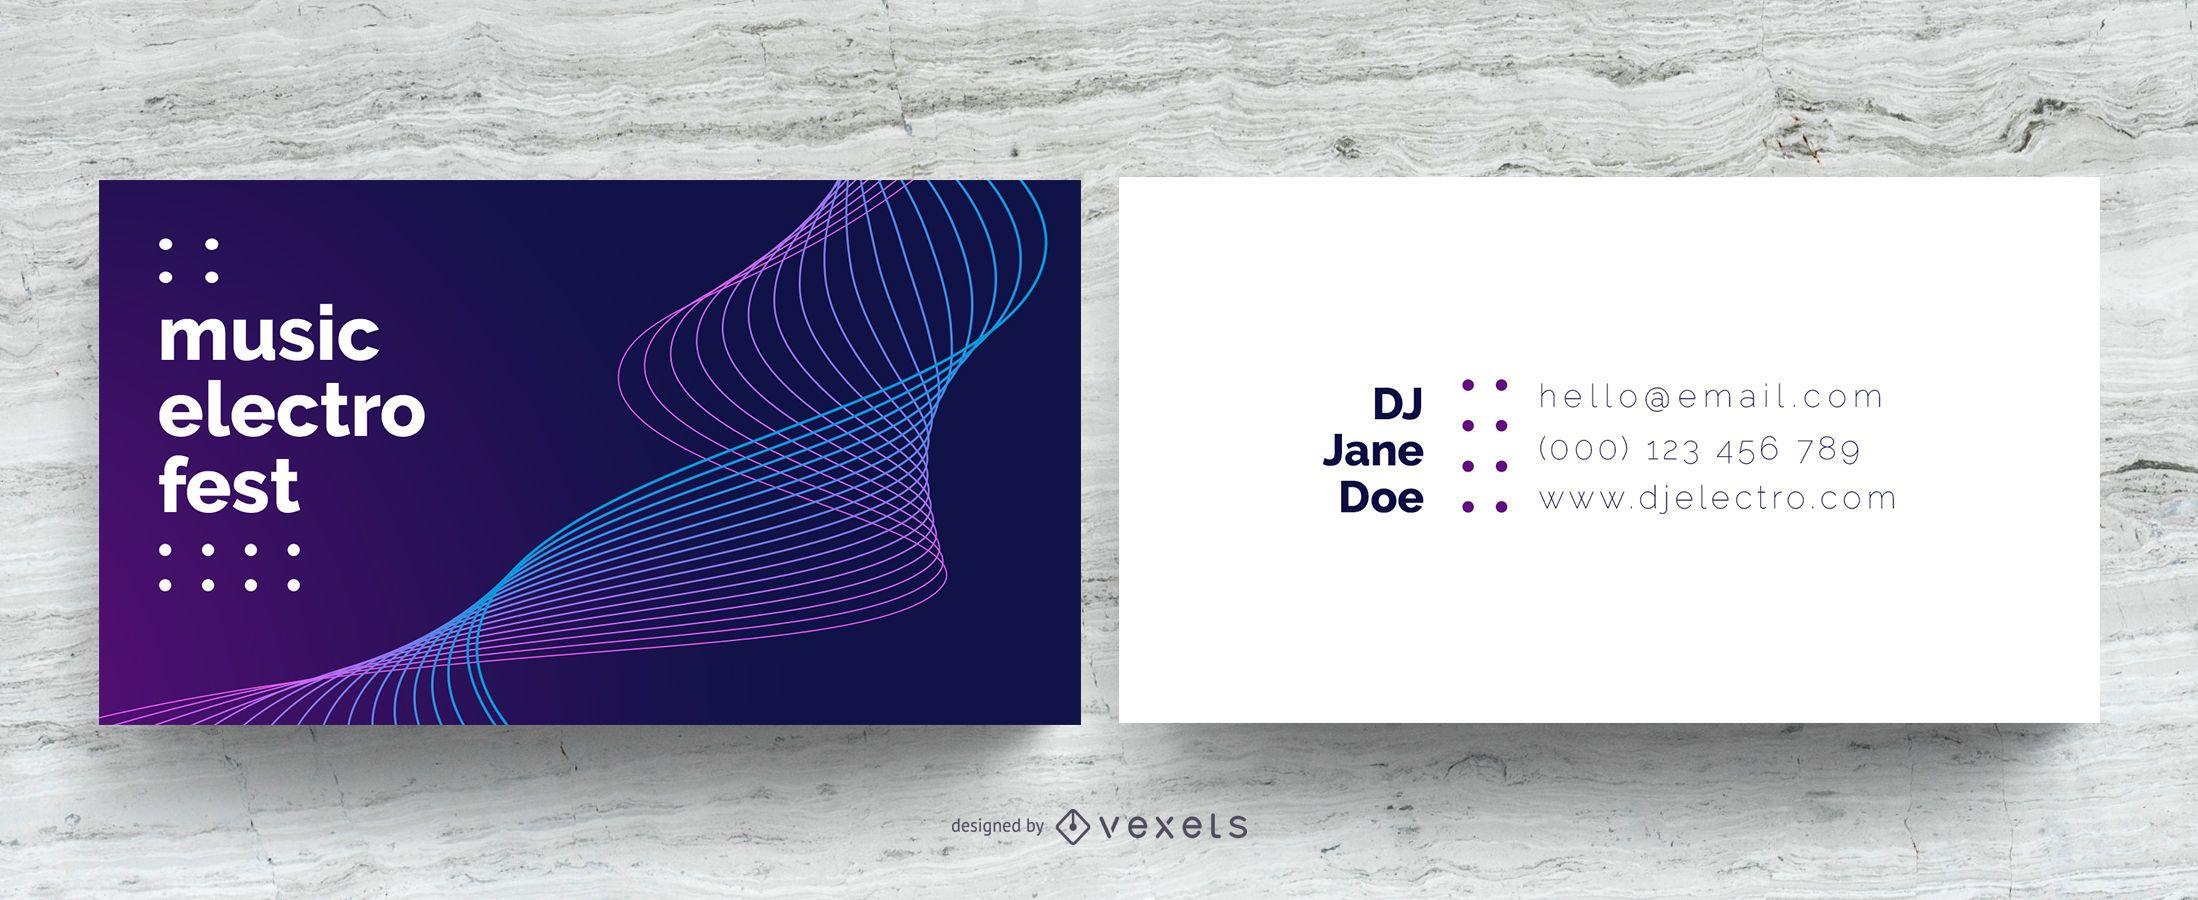 Electro music dj business card